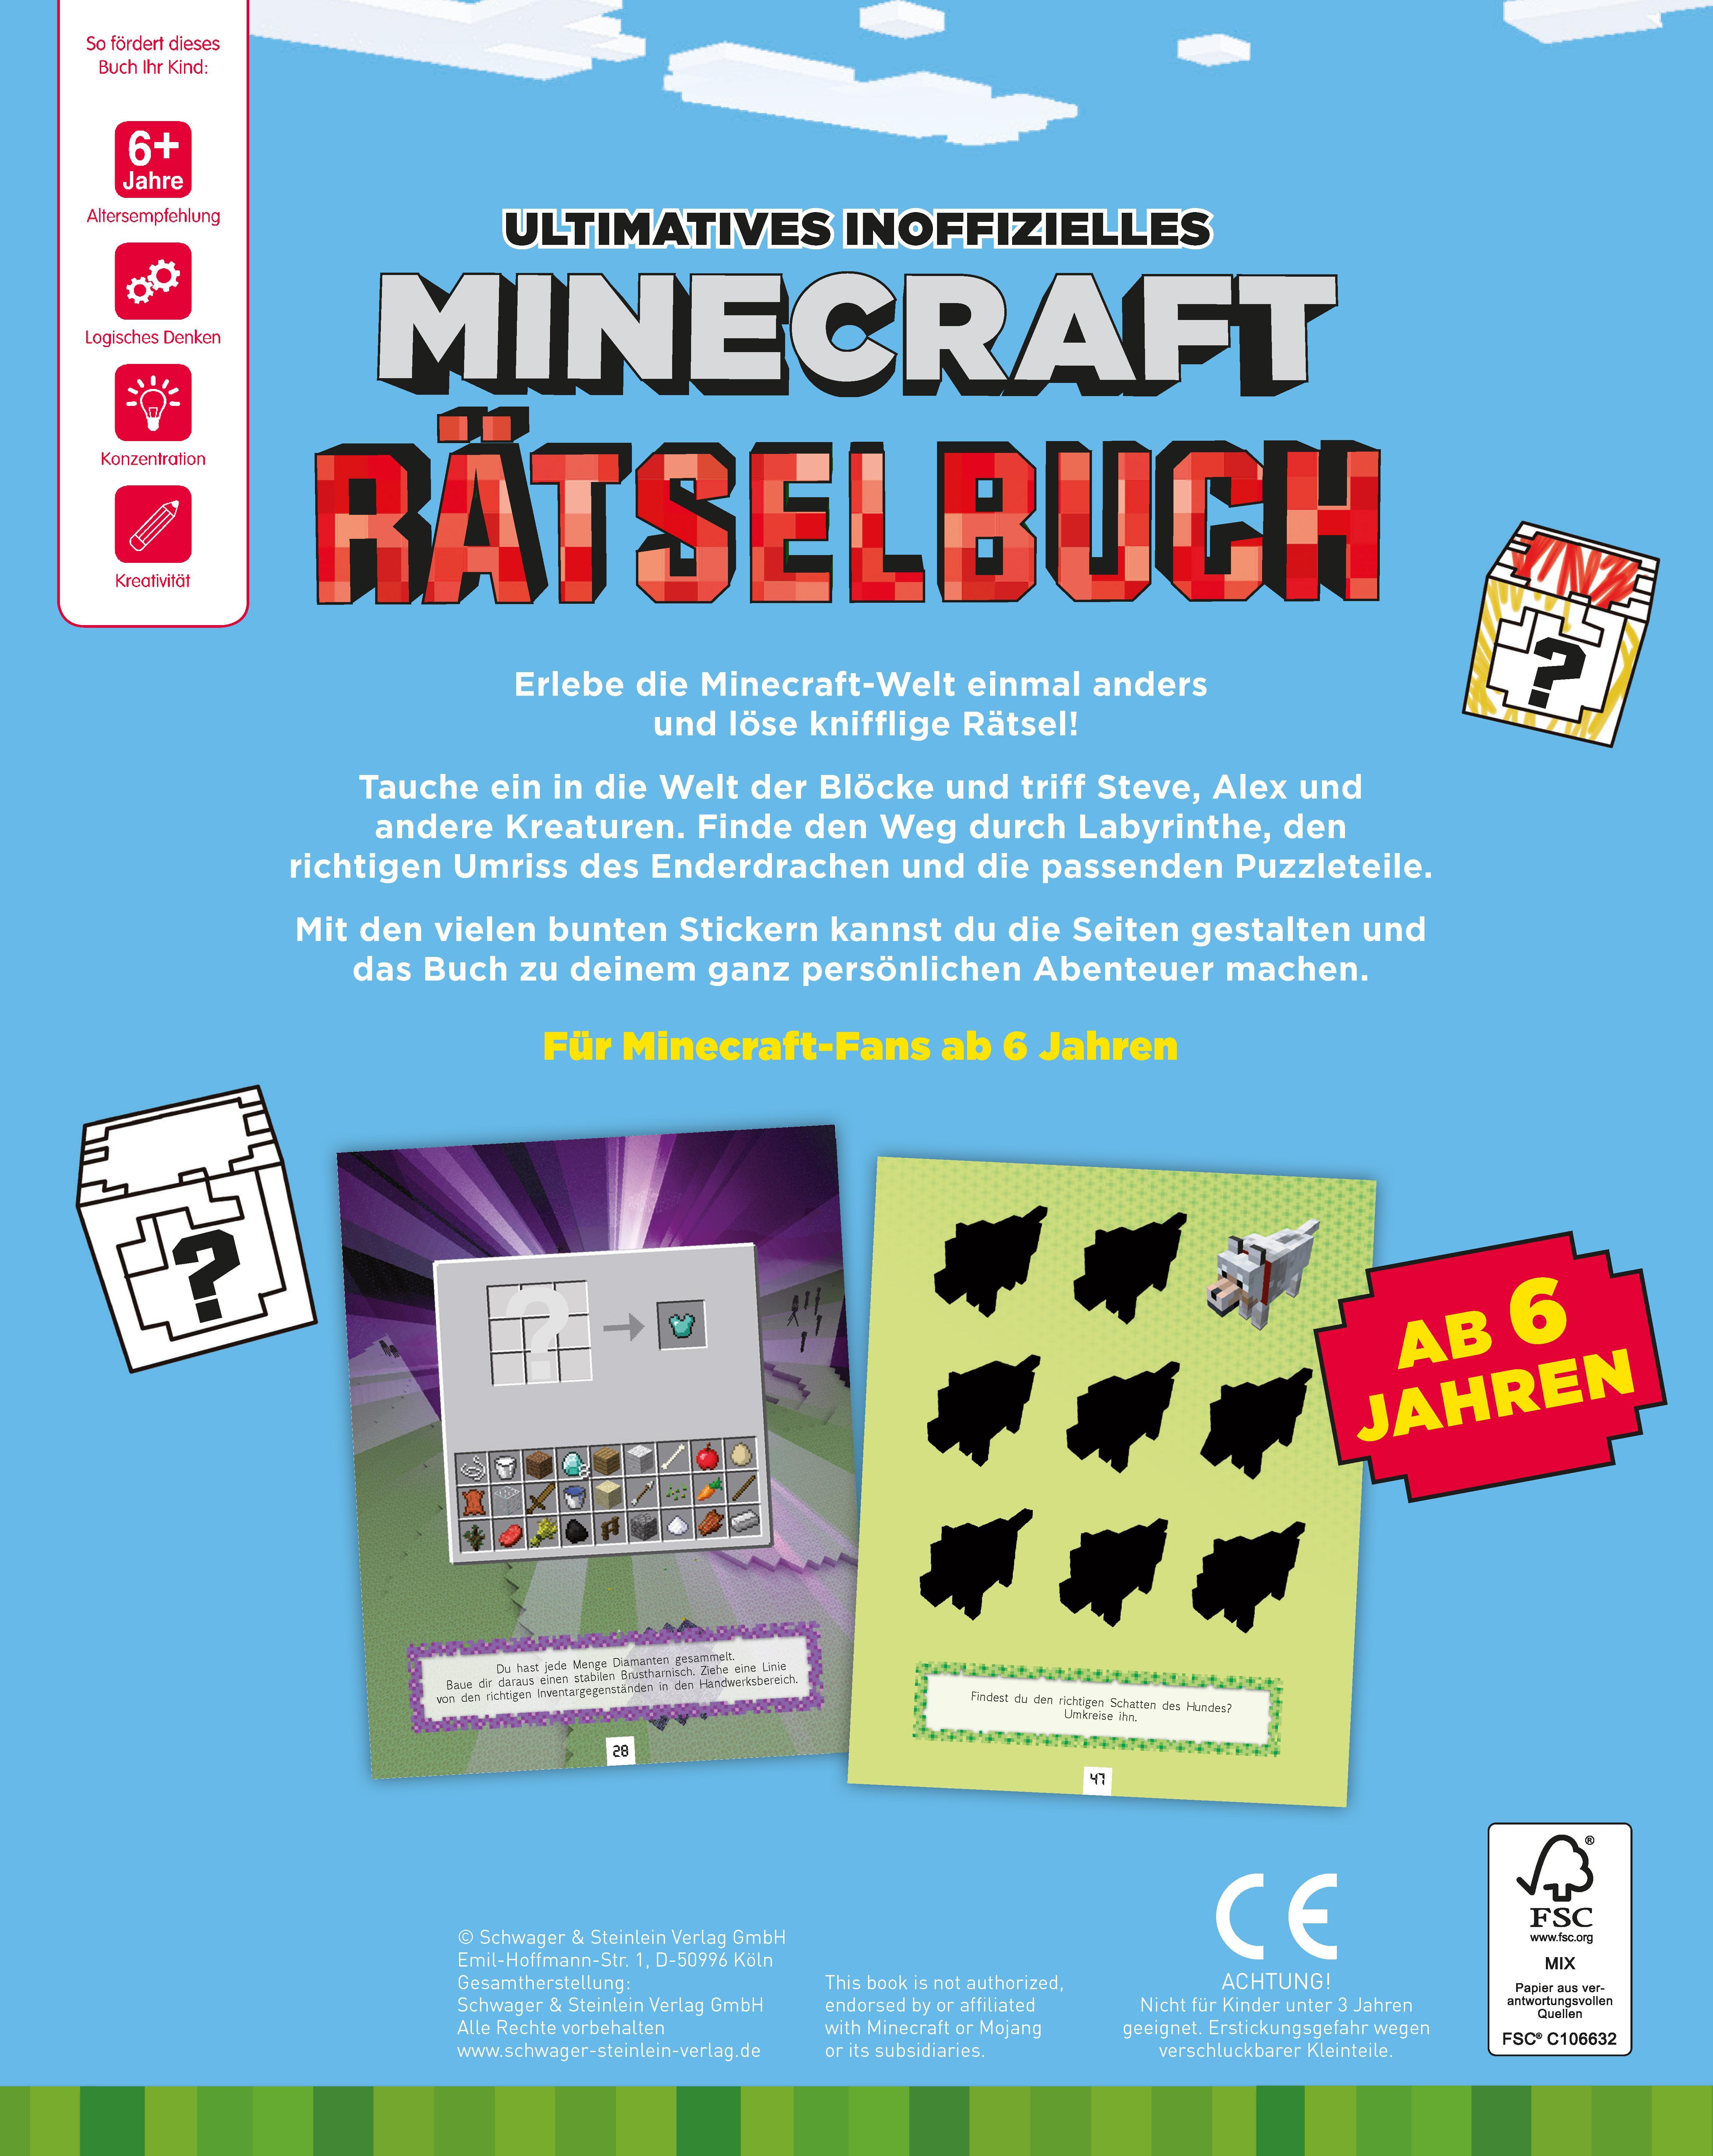 Ultimatives Inoffizielles Minecraft Rätselbuch Mit Vielen Bunten